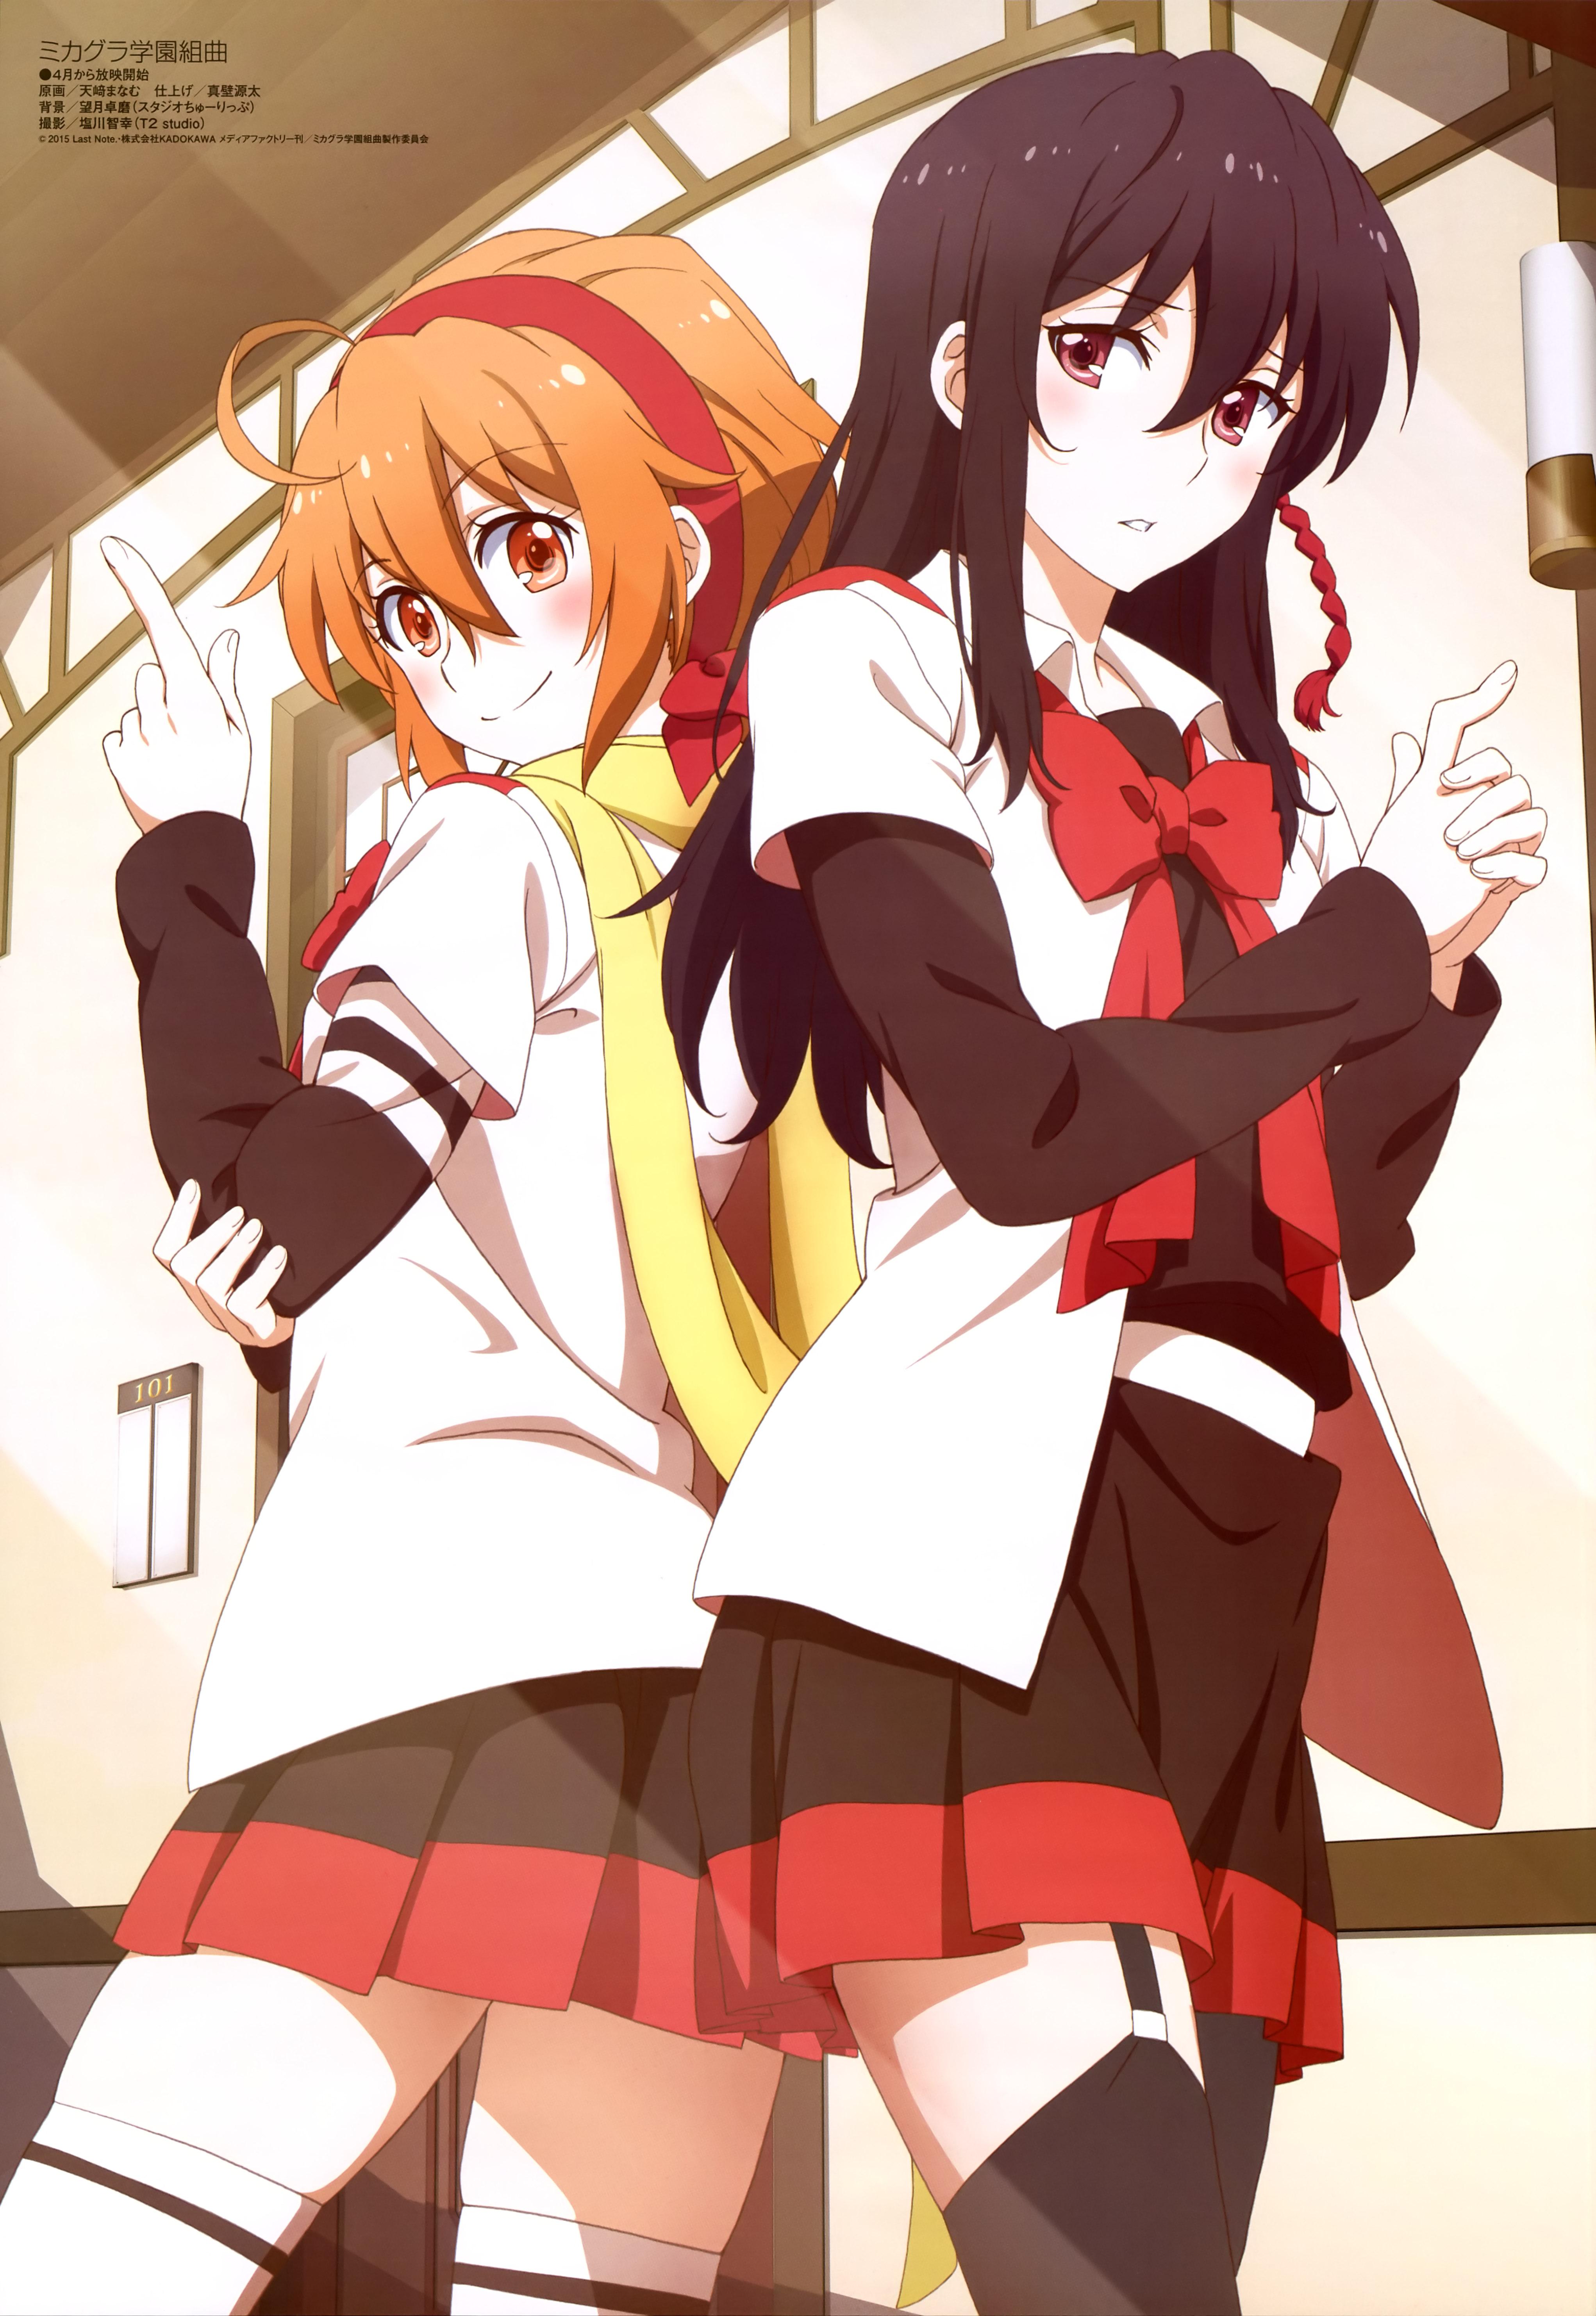 Megami MAGAZINE April 2015 anime posters Haruhichan.com Mikagura Gakuen Kumiyoku